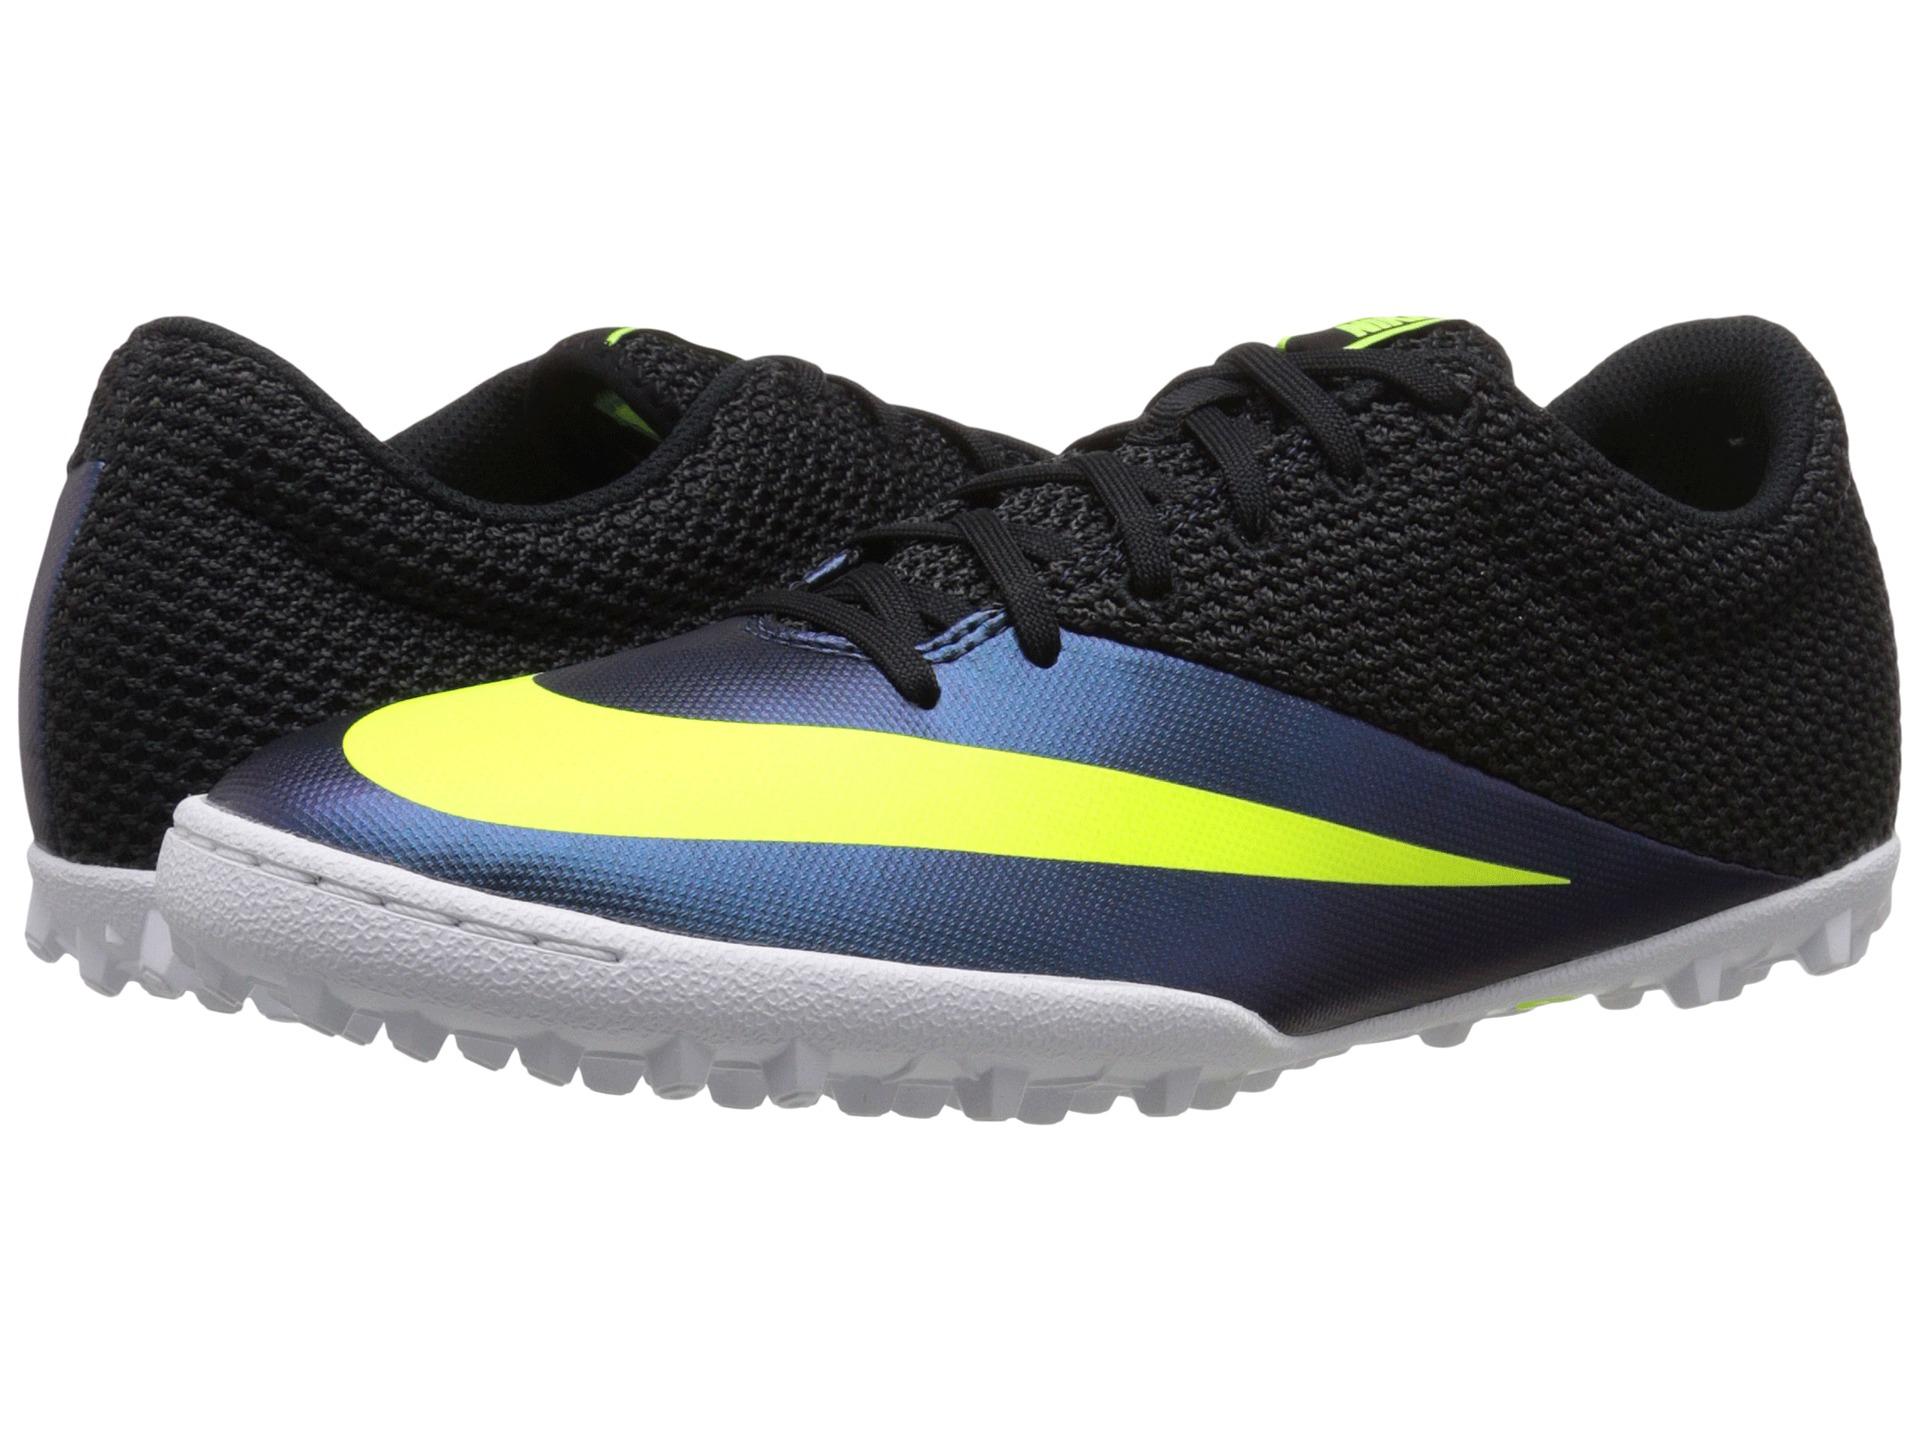 nike mercurialx kids shoes for sale